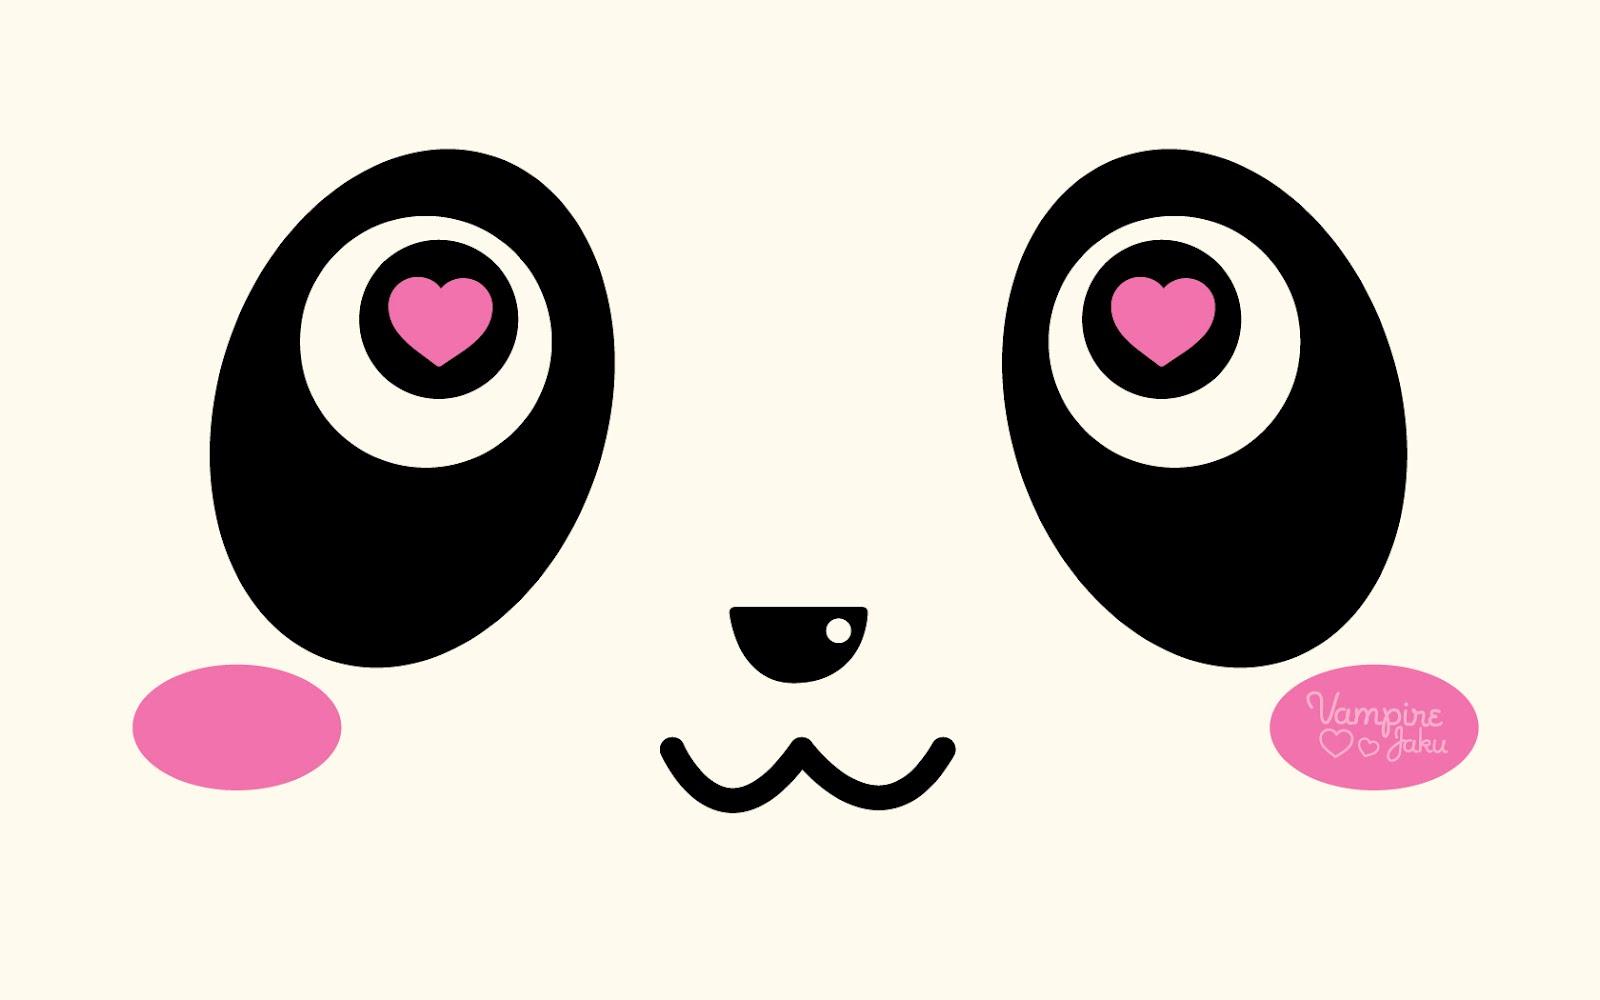 Good Wallpaper Minecraft Kawaii - Panda_Face_Loves_You_Wallpaper_by_VampireJaku  Pic_31786.jpg